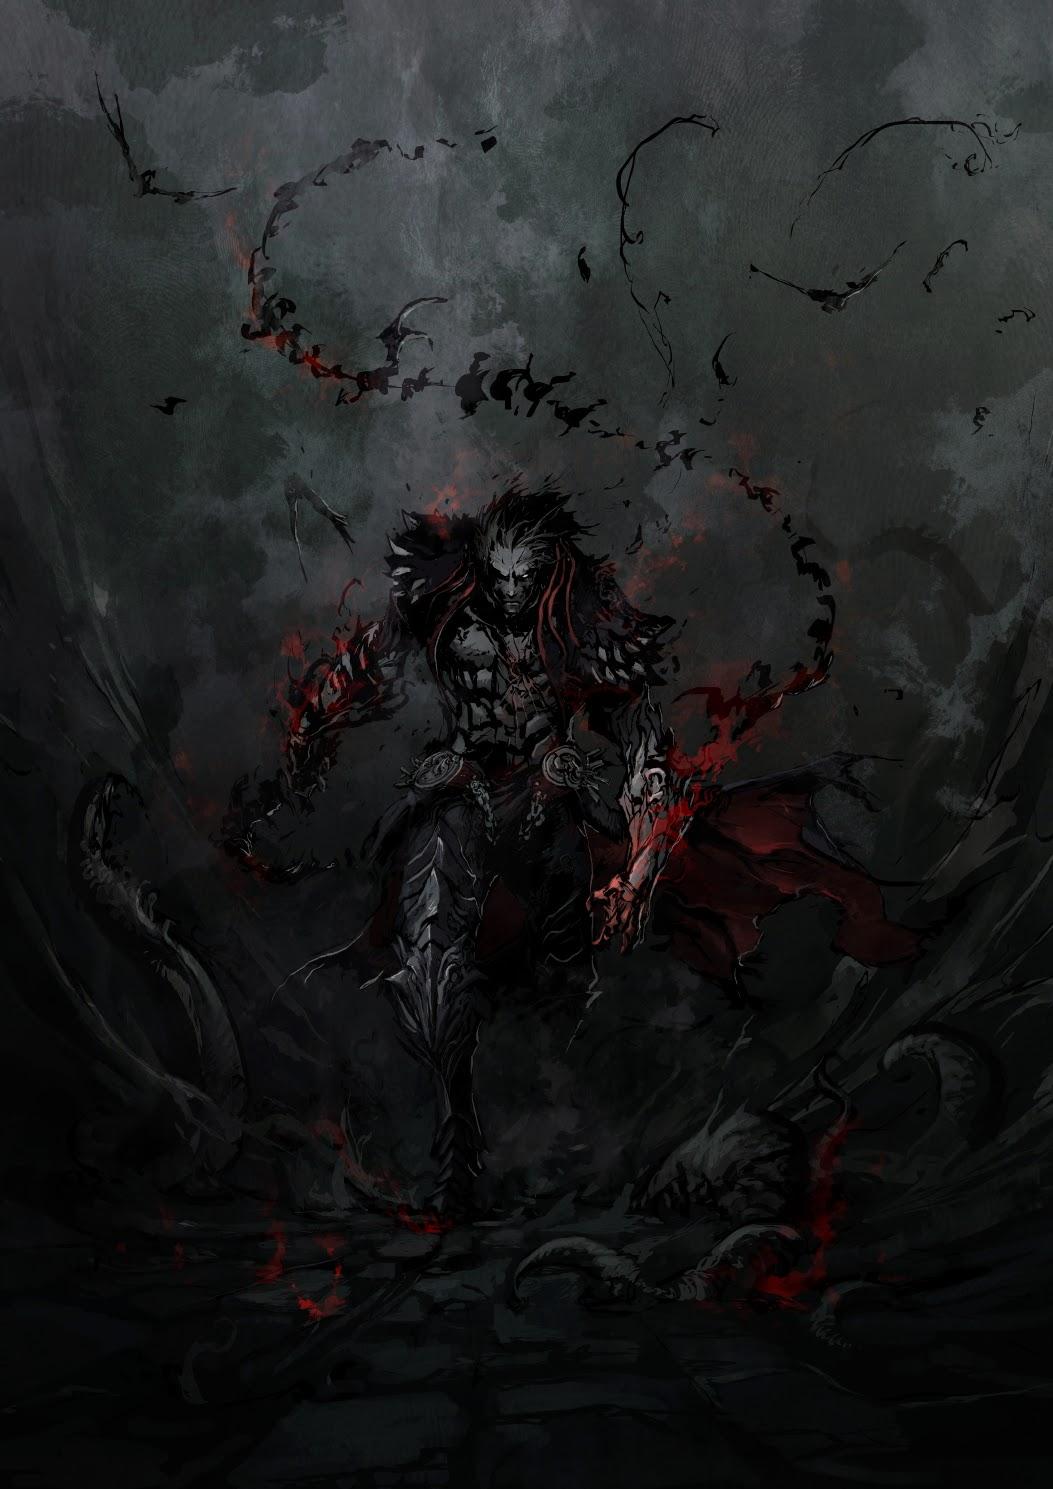 https://game-saga.com/wp-content/uploads/2018/12/castlevania-lords-of-shadow-2-artwork-2.jpg